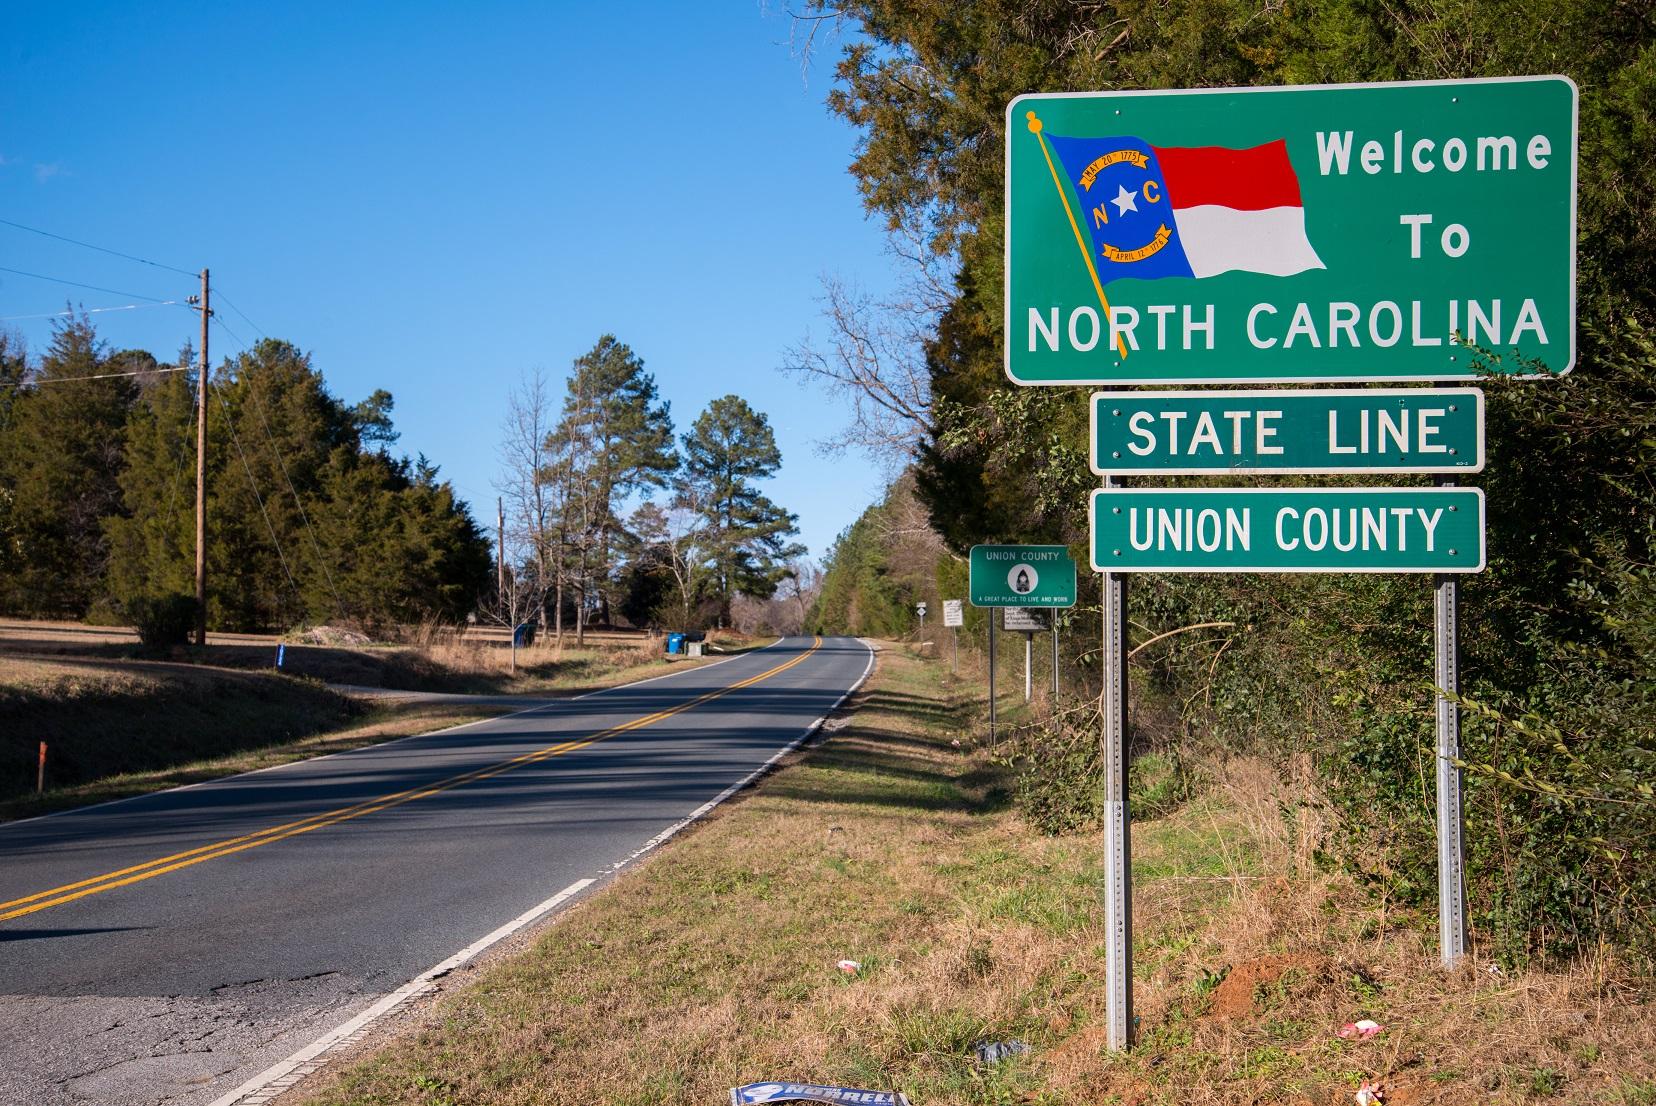 north carolina state laws on abortion essay